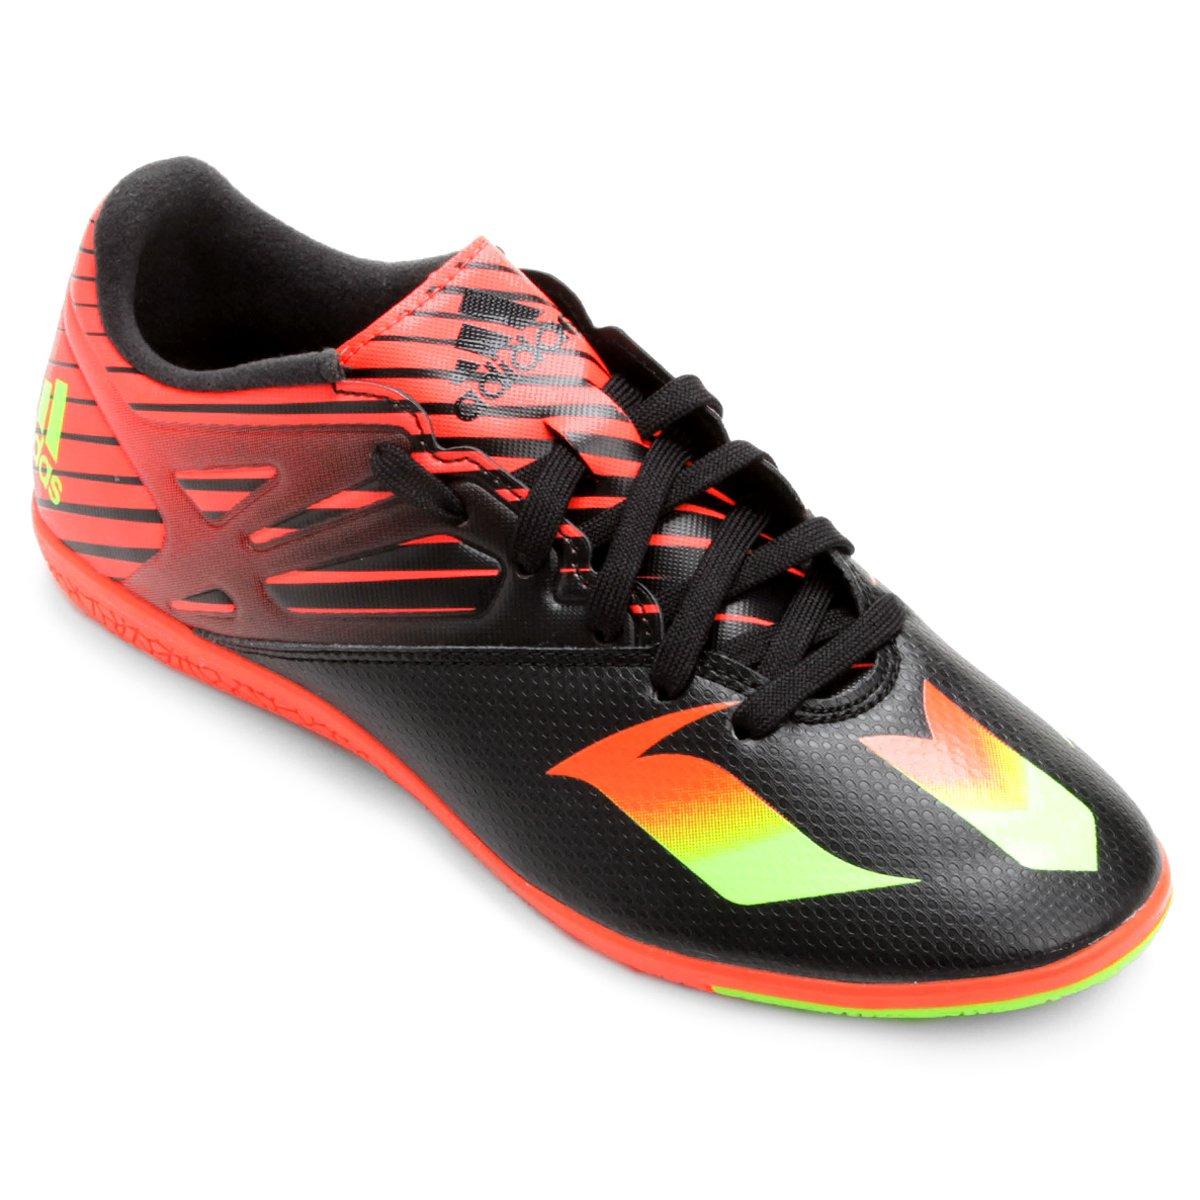 79a0b95f1b Chuteira Futsal Adidas Messi 15.3 IN - Compre Agora